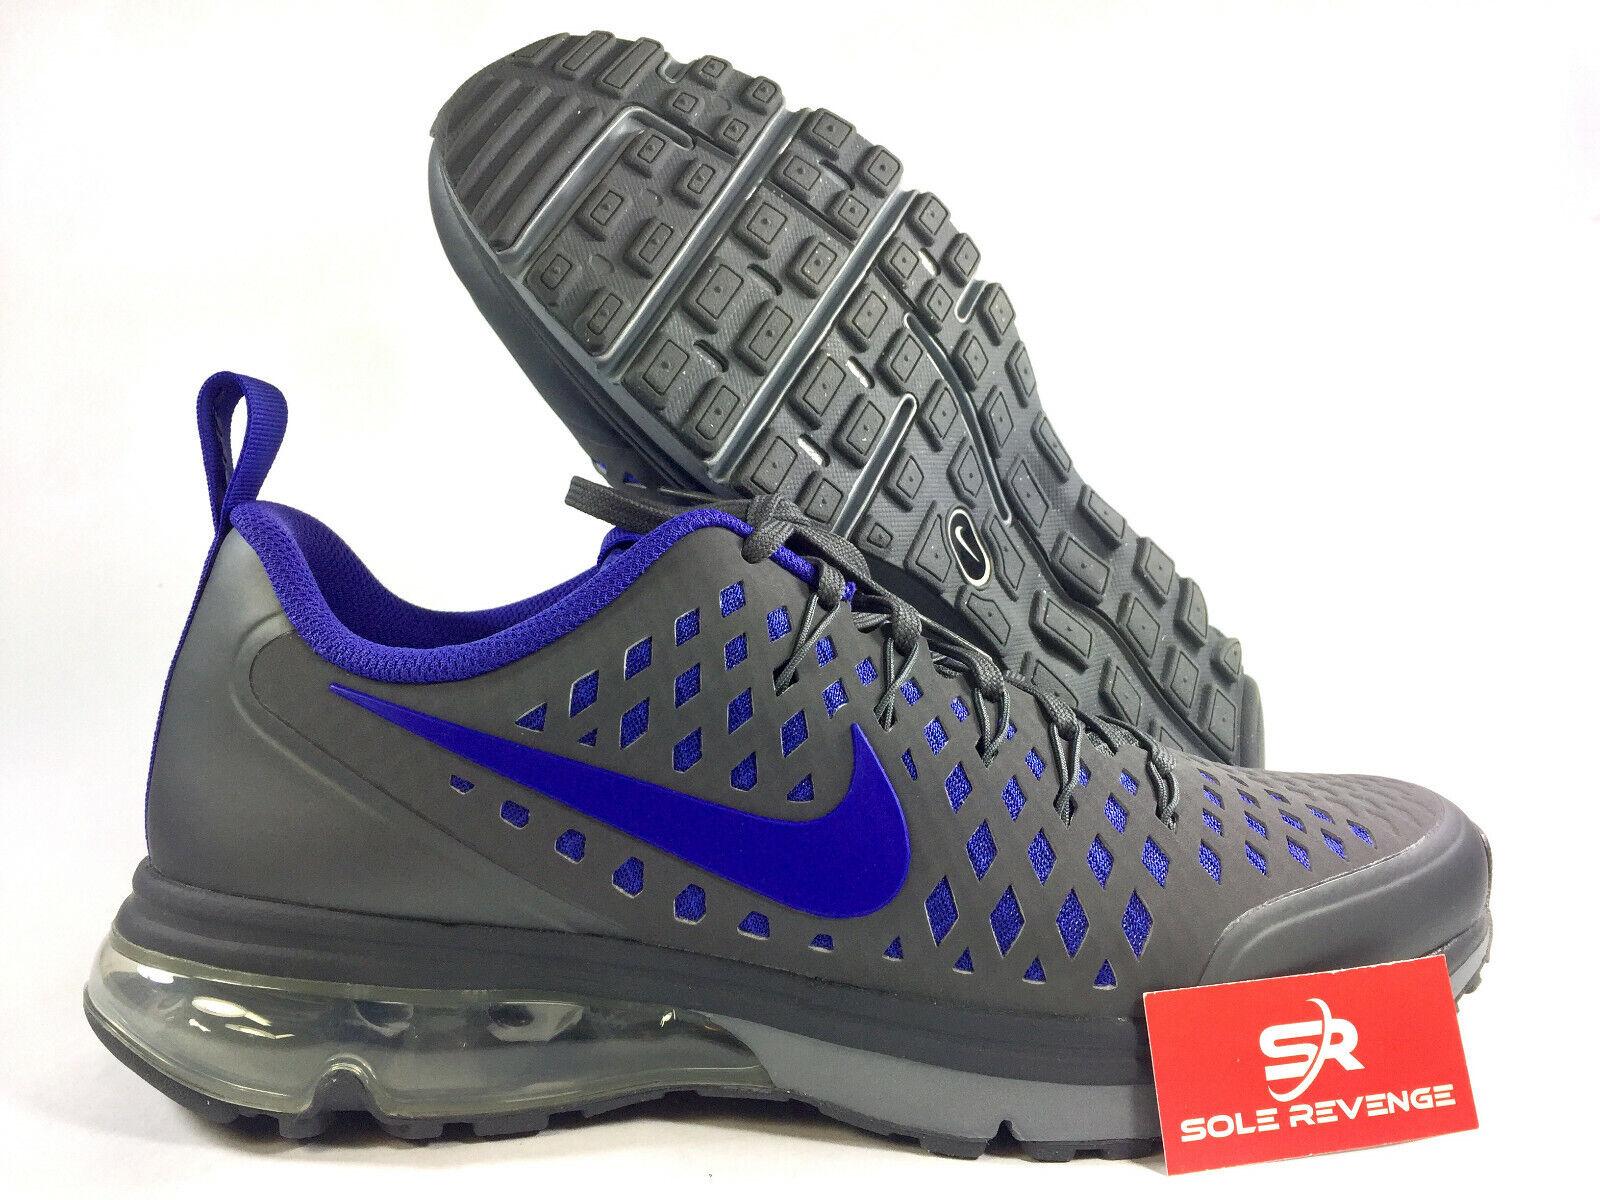 10.5 New NIKE AIR MAX SUPREME 3 Dark Grey purple Purple shoes 706993-040 x1